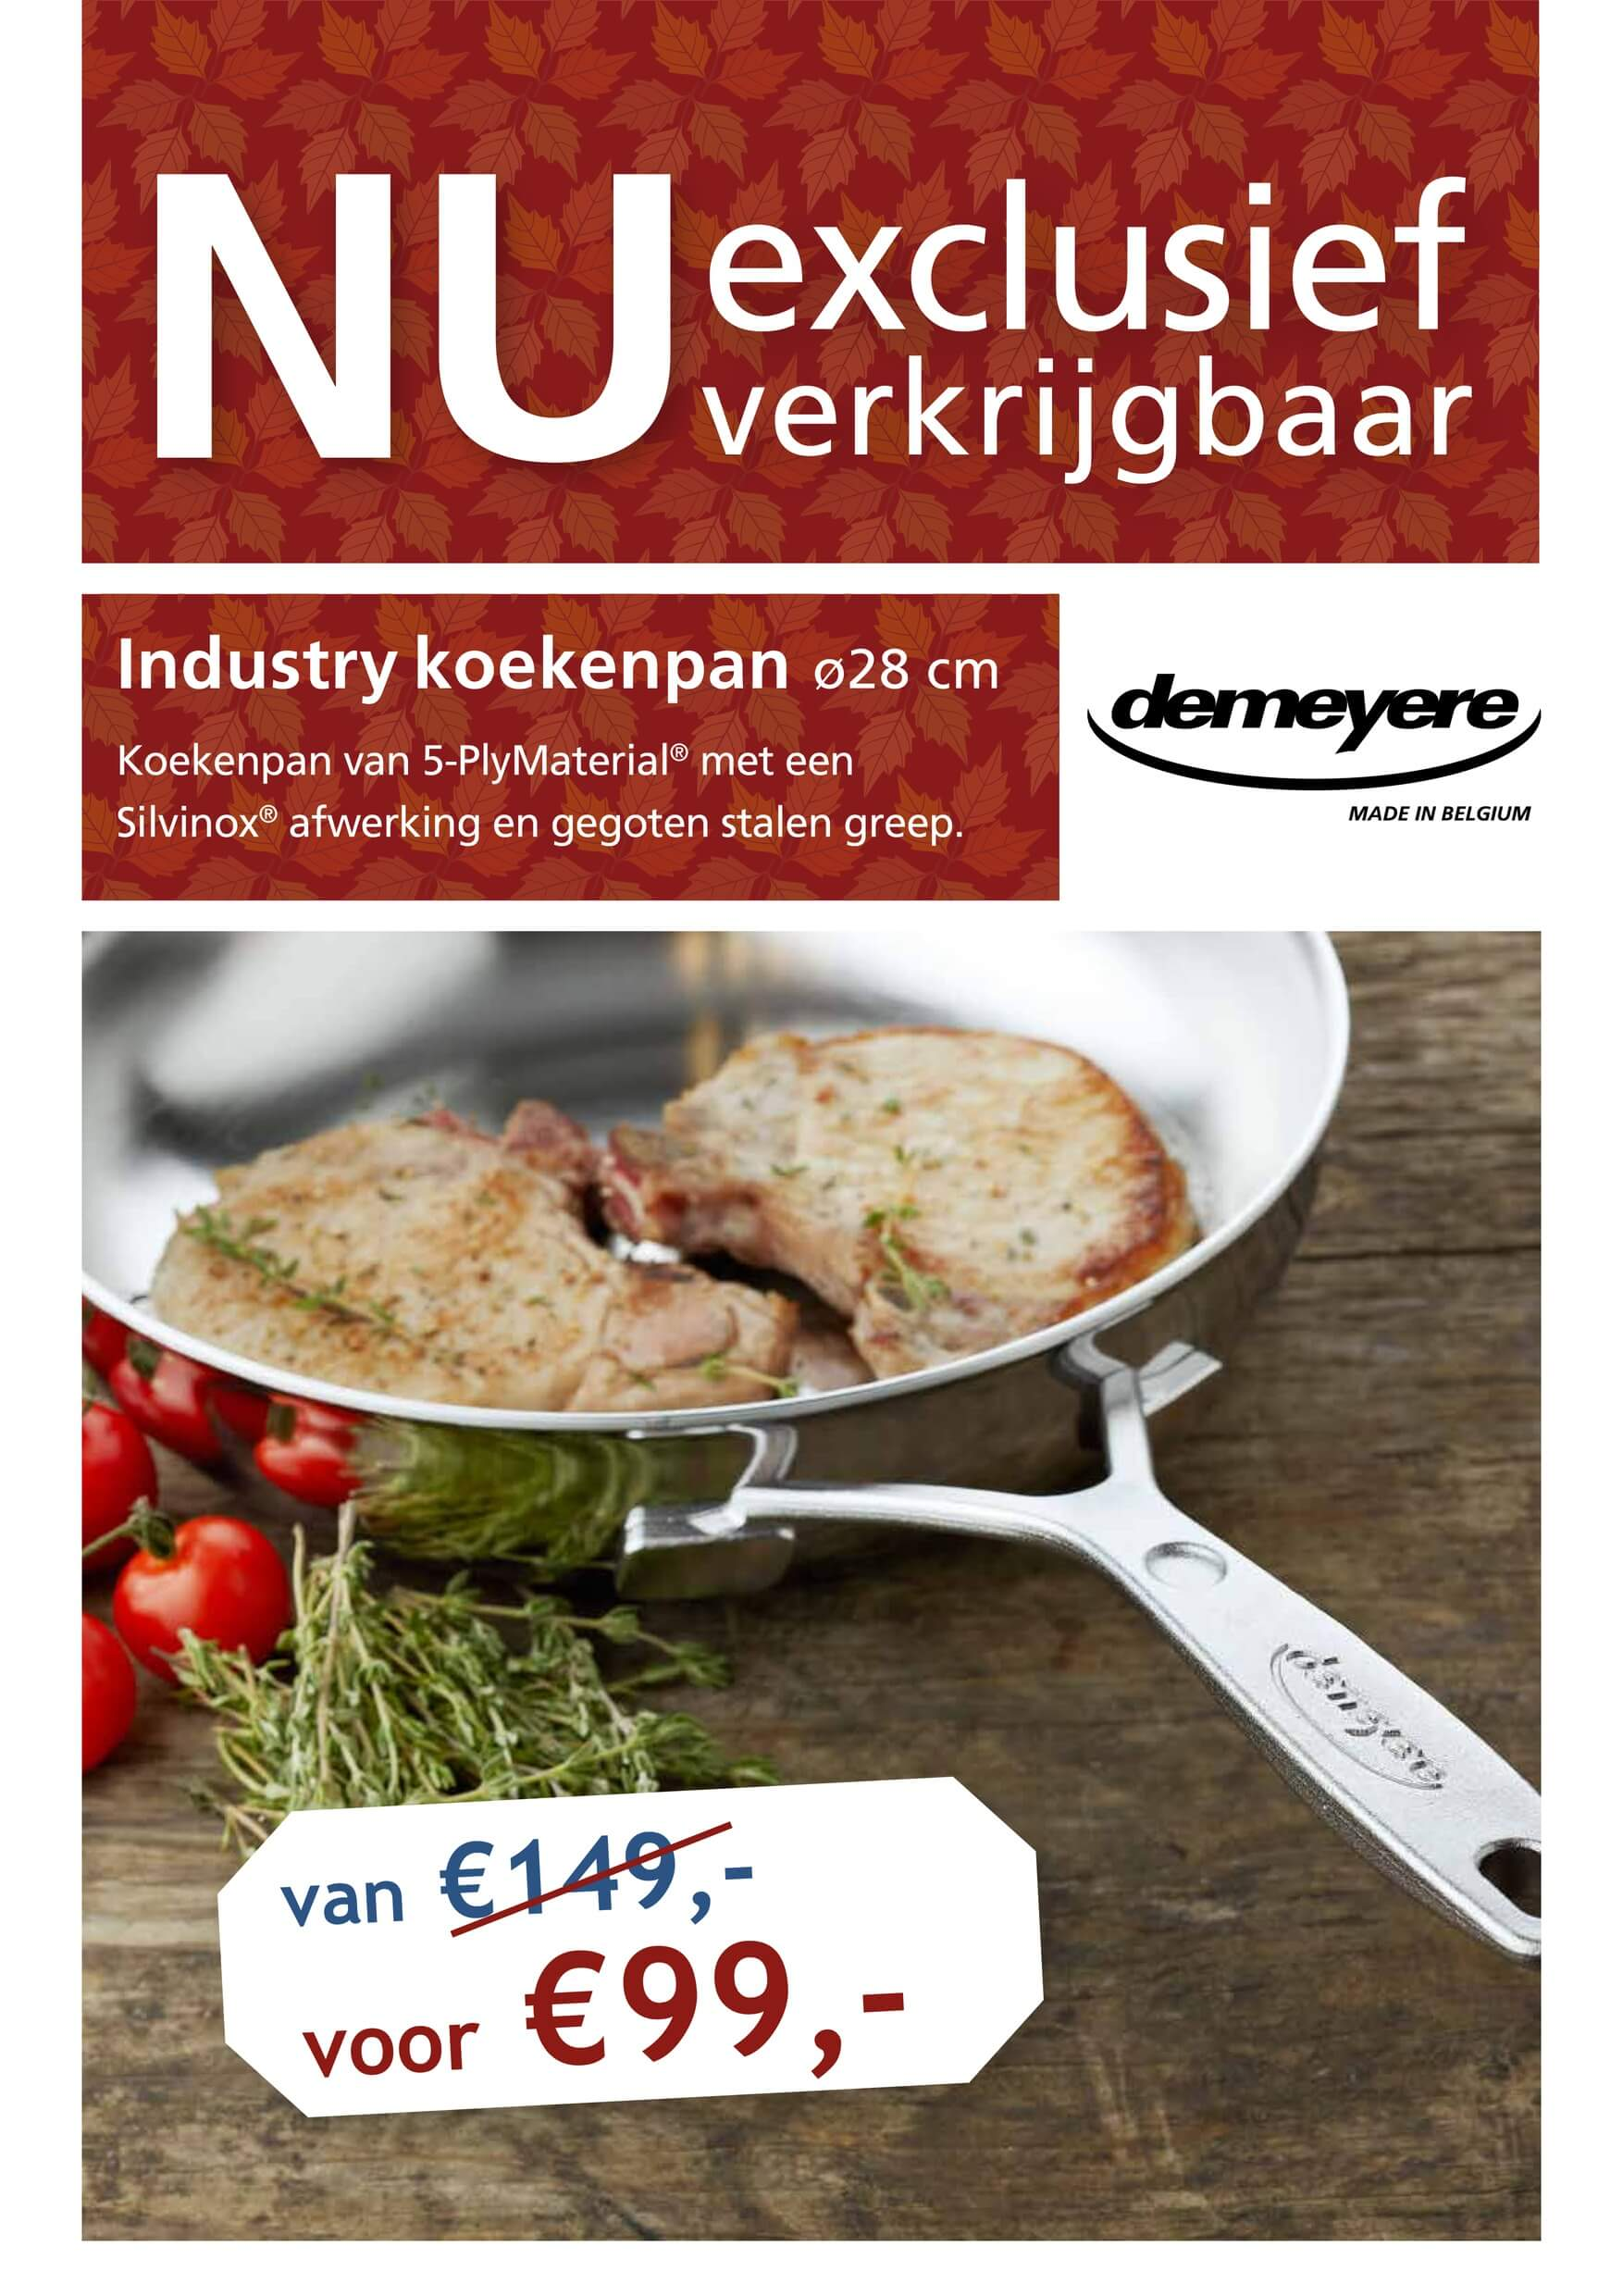 Industry koekenpan DeMeyere Ø 28 cm.